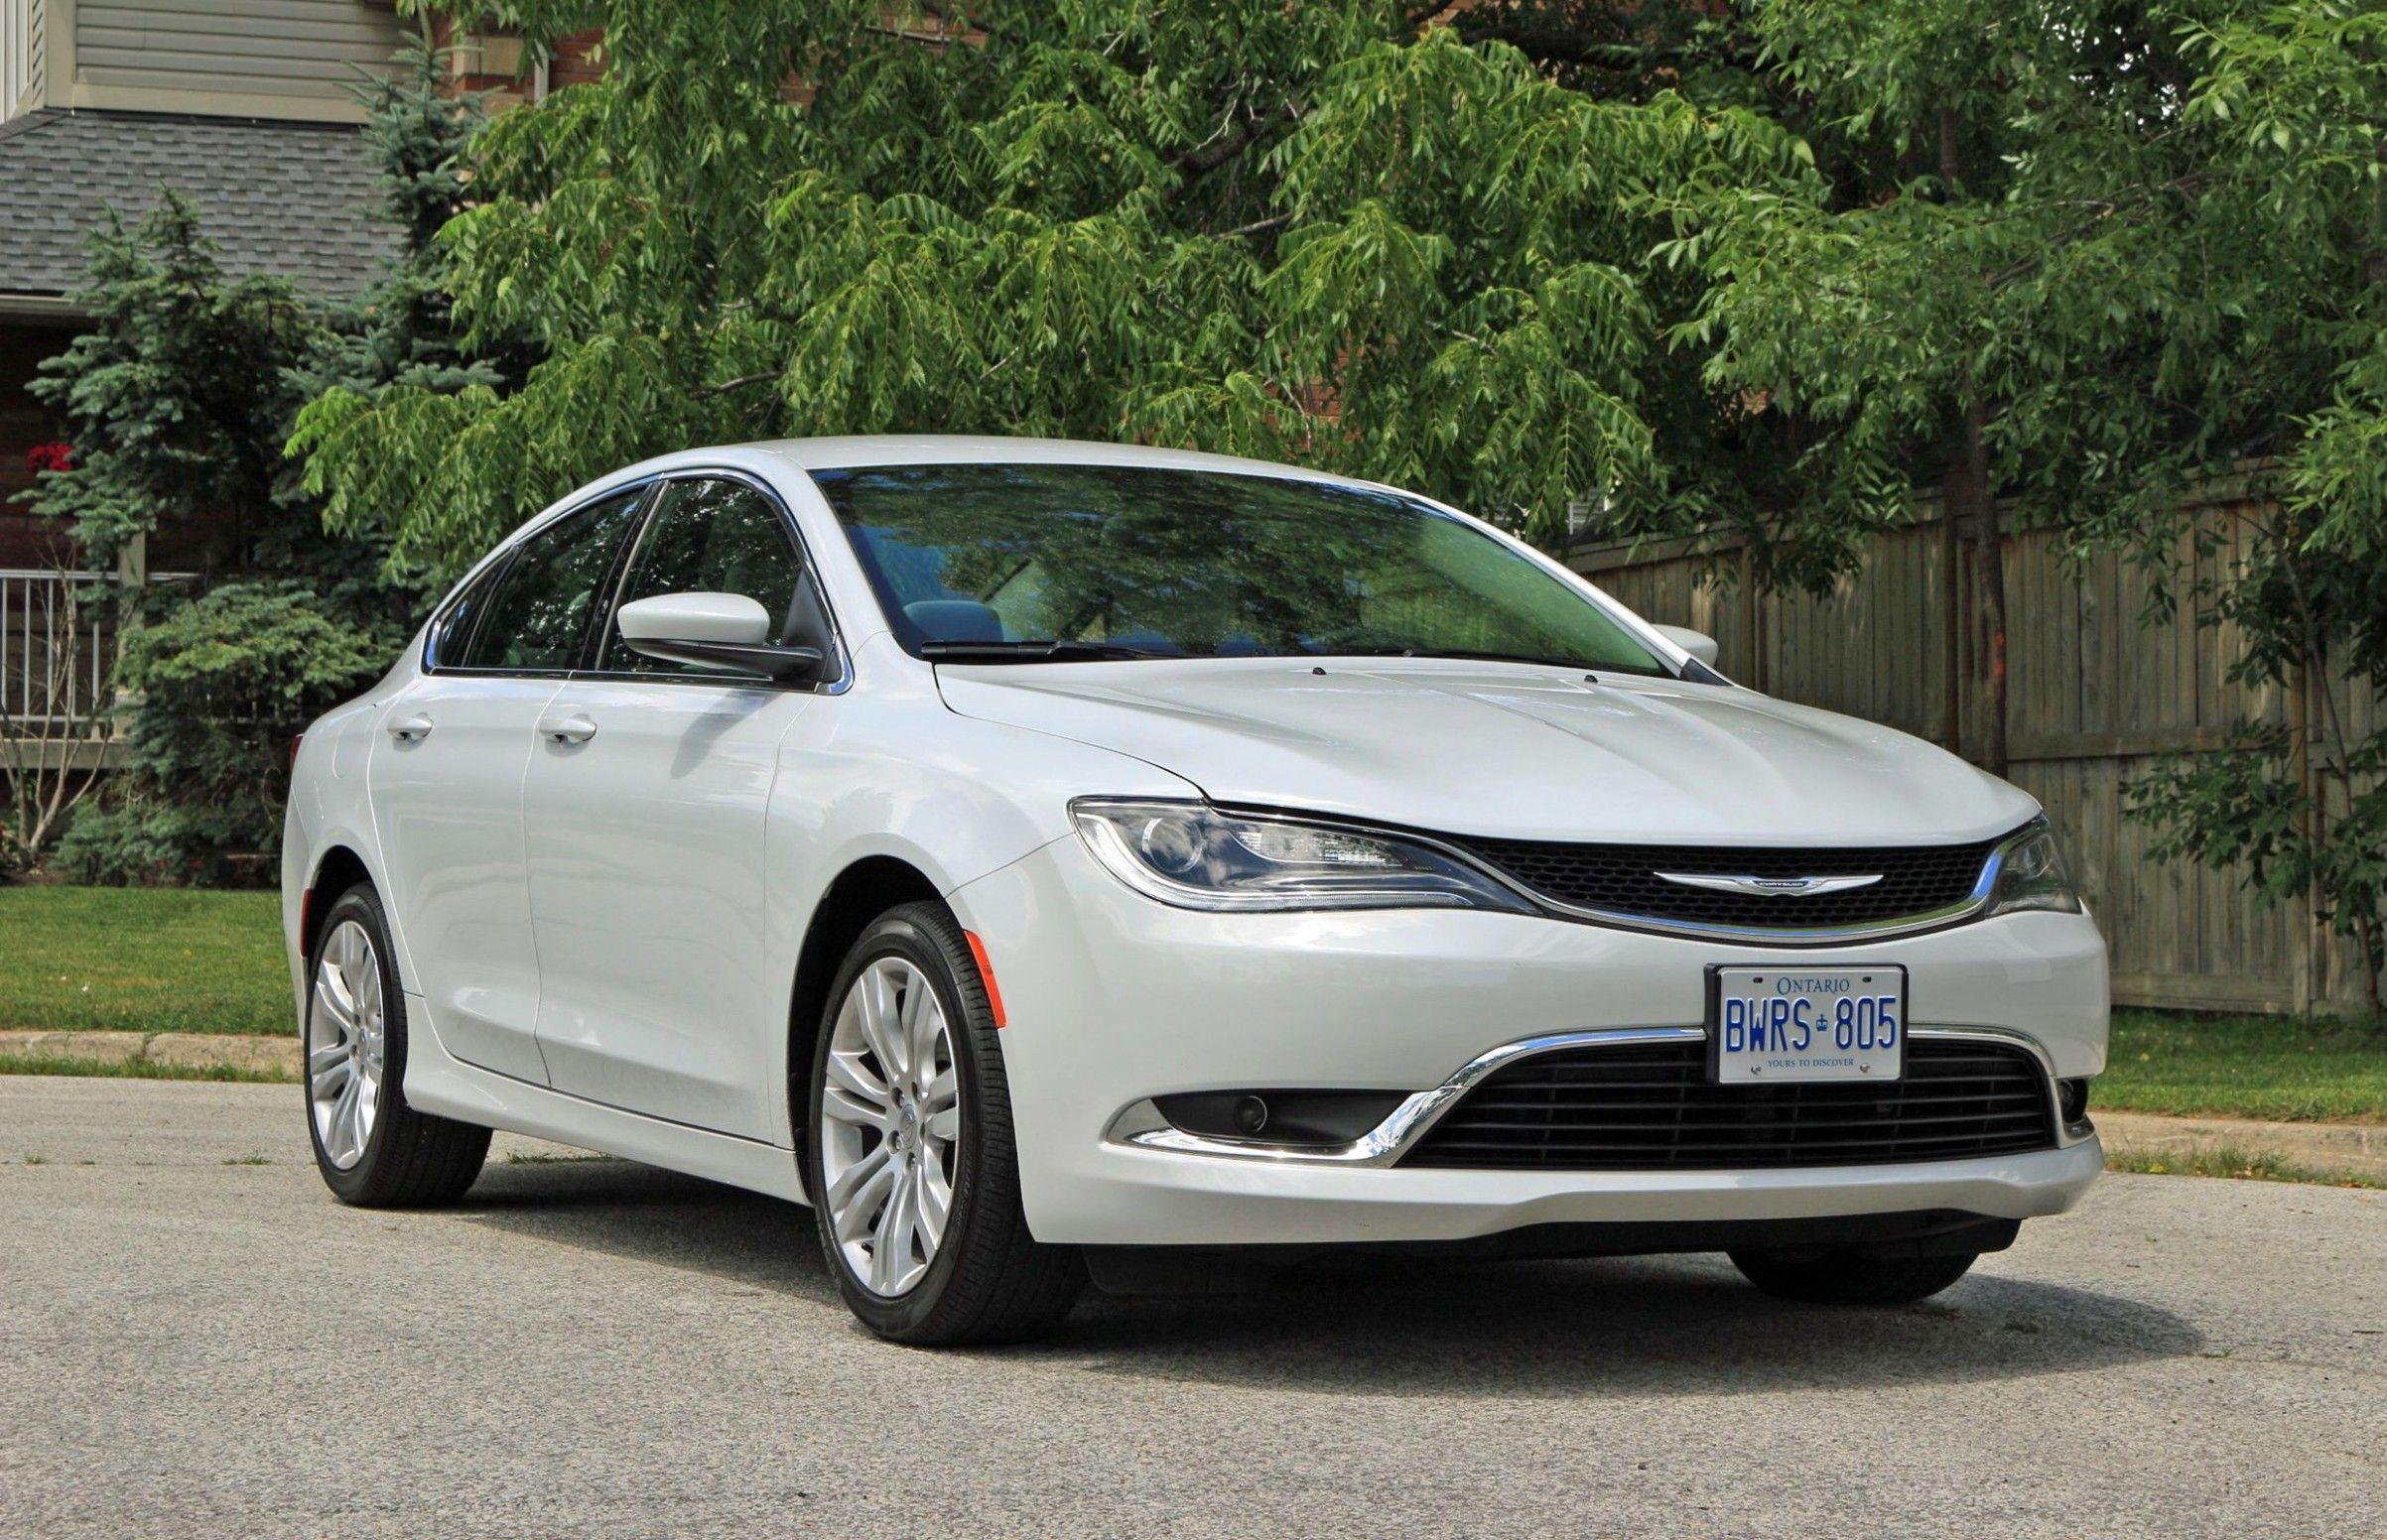 2020 Chrysler 200 Convertible Release | Chrysler 200 ...